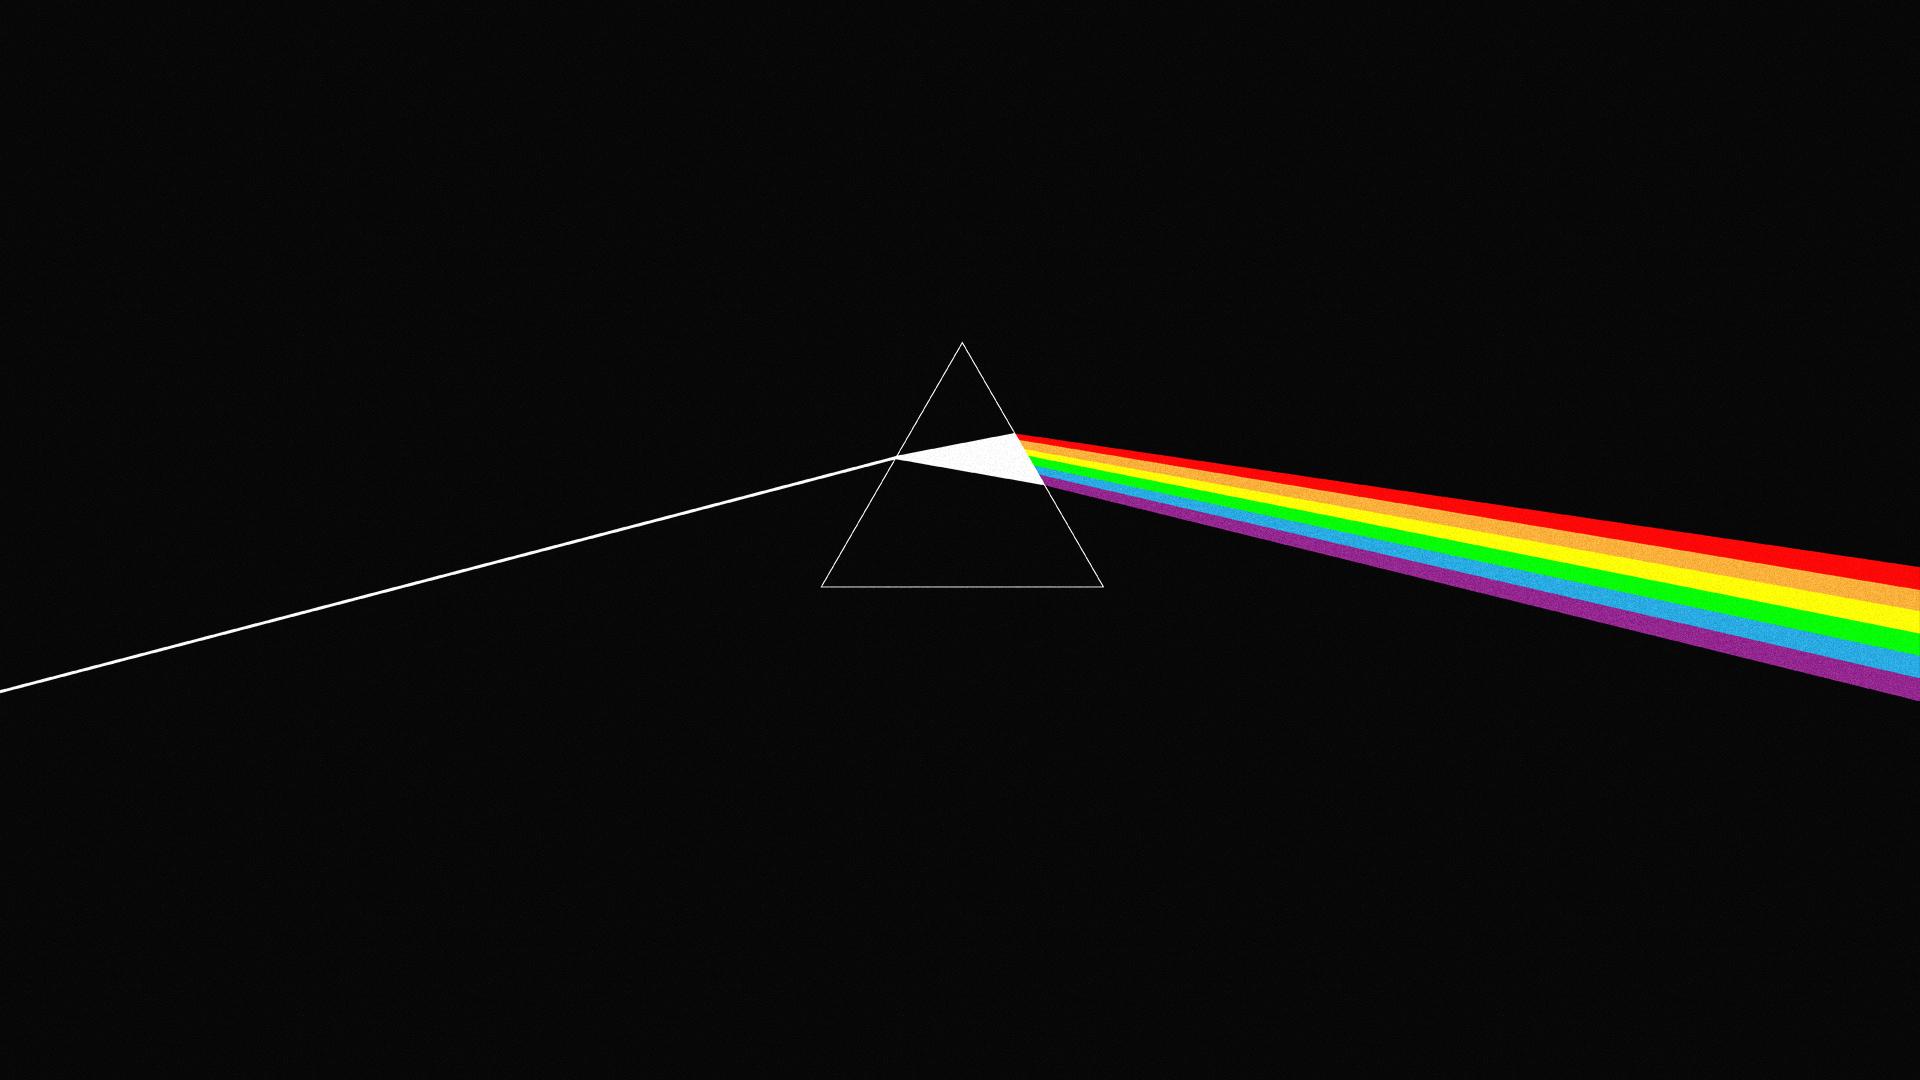 Pink Floyd Wallpaper 1920x1080 54932